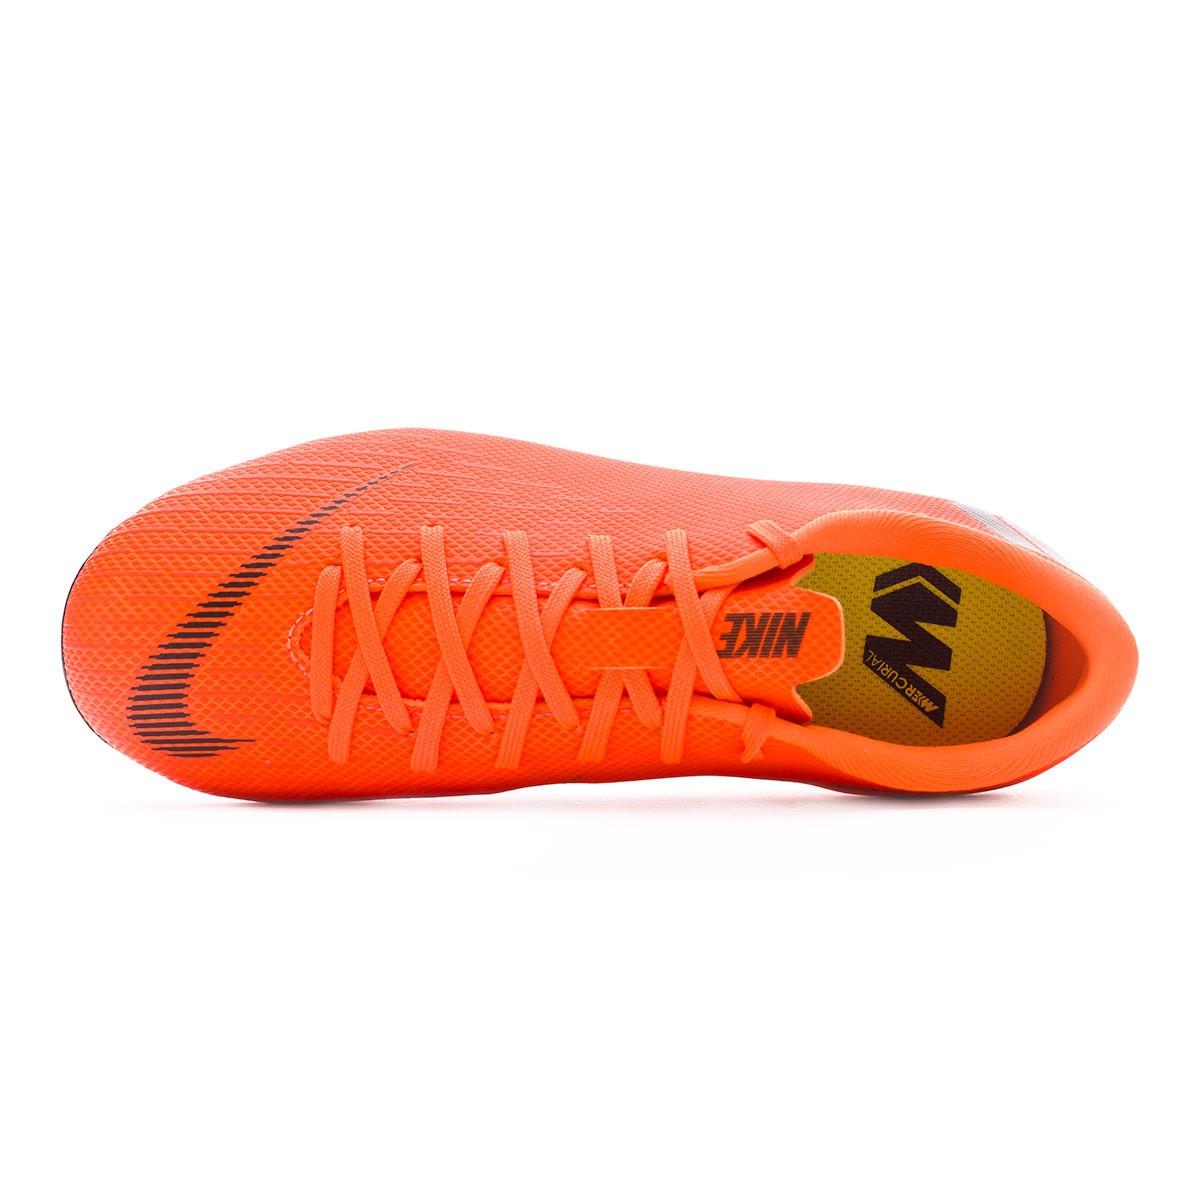 7b96aa5b7 Football Boots Nike Kids Mercurial Vapor XII Academy GS MG Total  orange-Black-Volt - Tienda de fútbol Fútbol Emotion